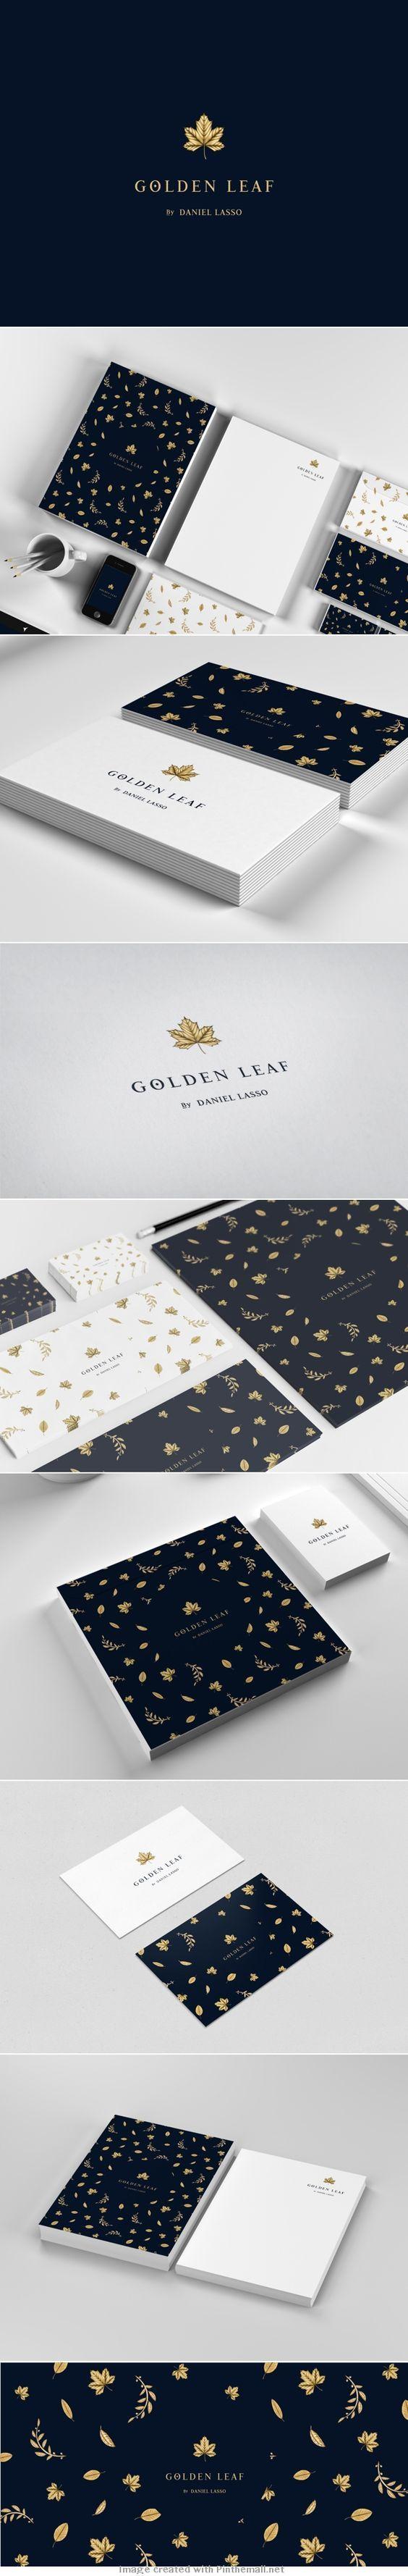 Best Brand Identity Design on the Internet, Golden Leaf #branding #brandidentity #design http://www.pinterest.com/aldenchong/: